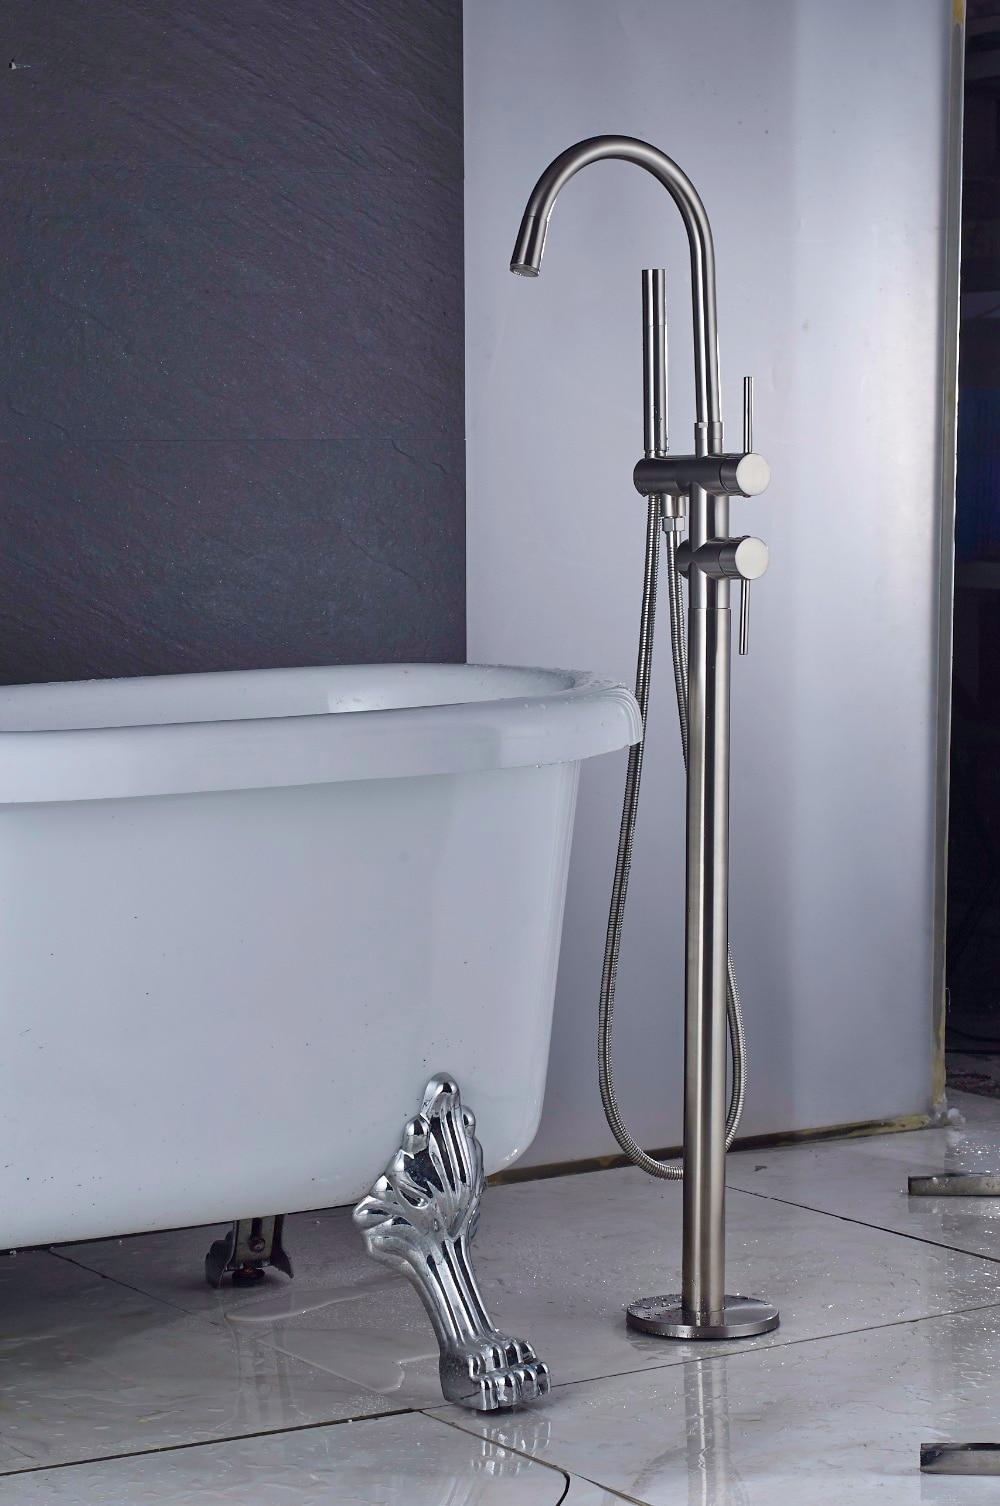 Quyanre Black Nickel Chrome Bathtub Shower Faucet Two Way Floor ...